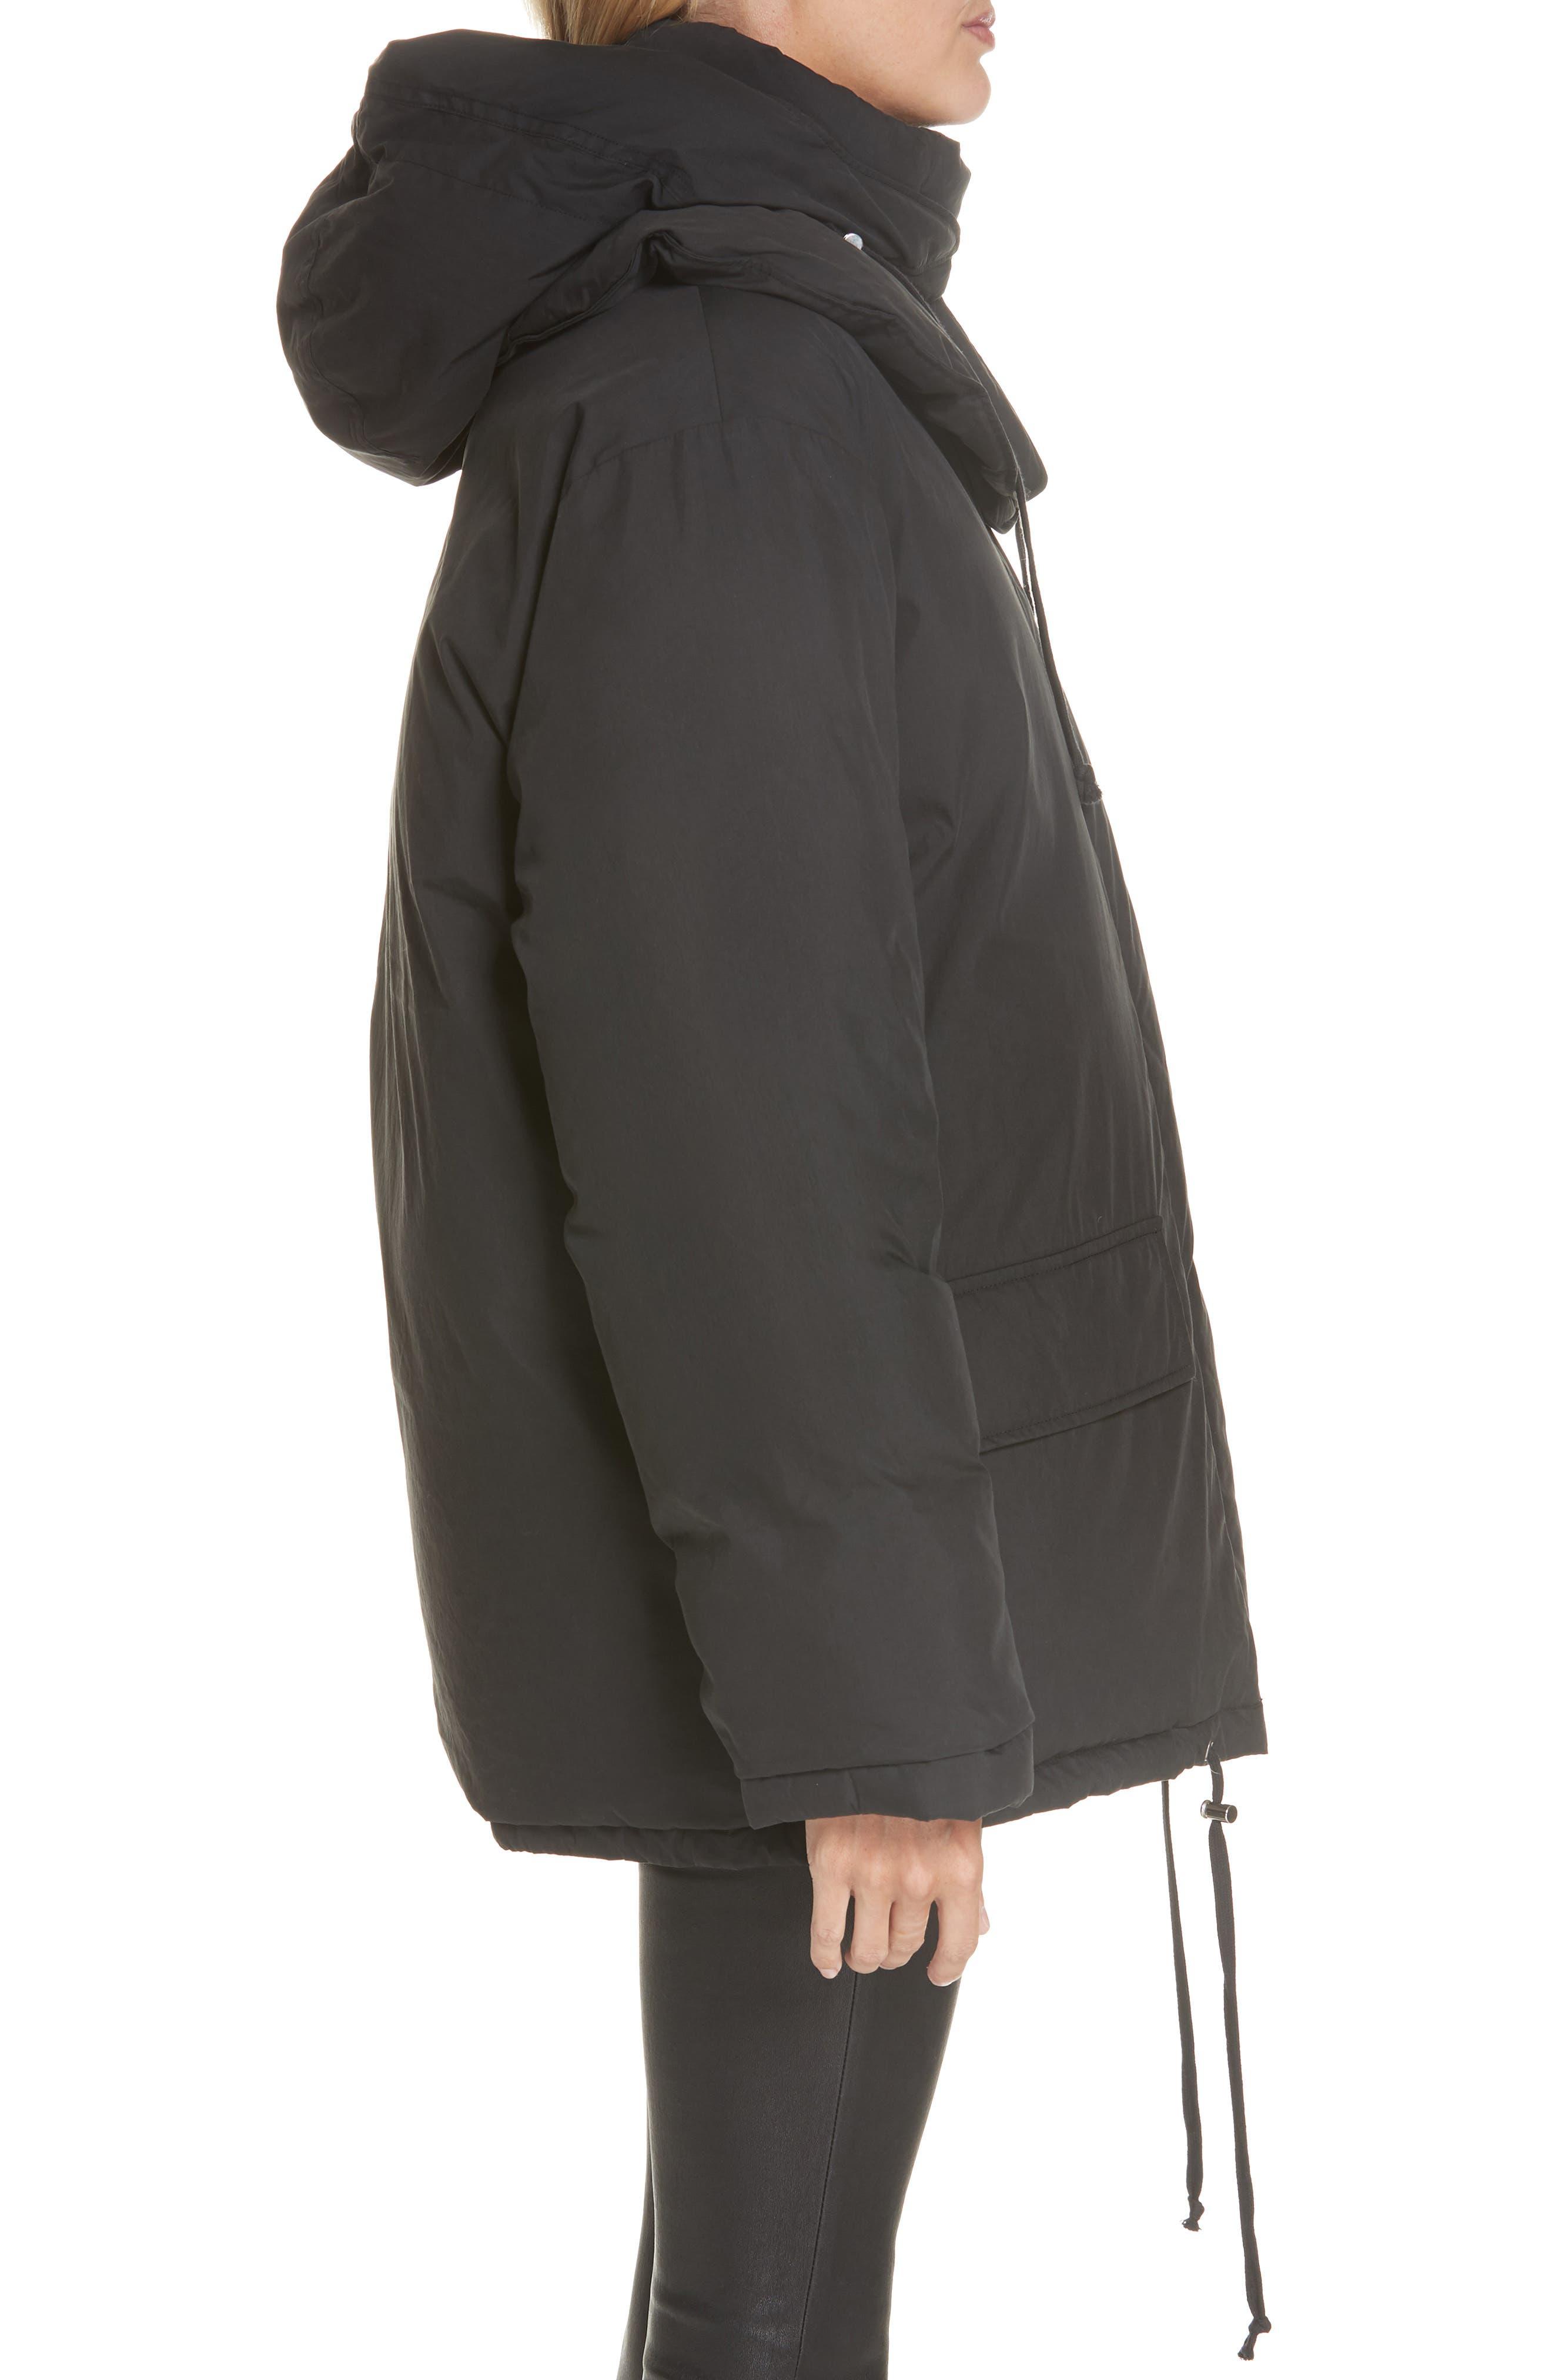 HELMUT LANG, Removable Hood Puffer Jacket, Alternate thumbnail 5, color, 001